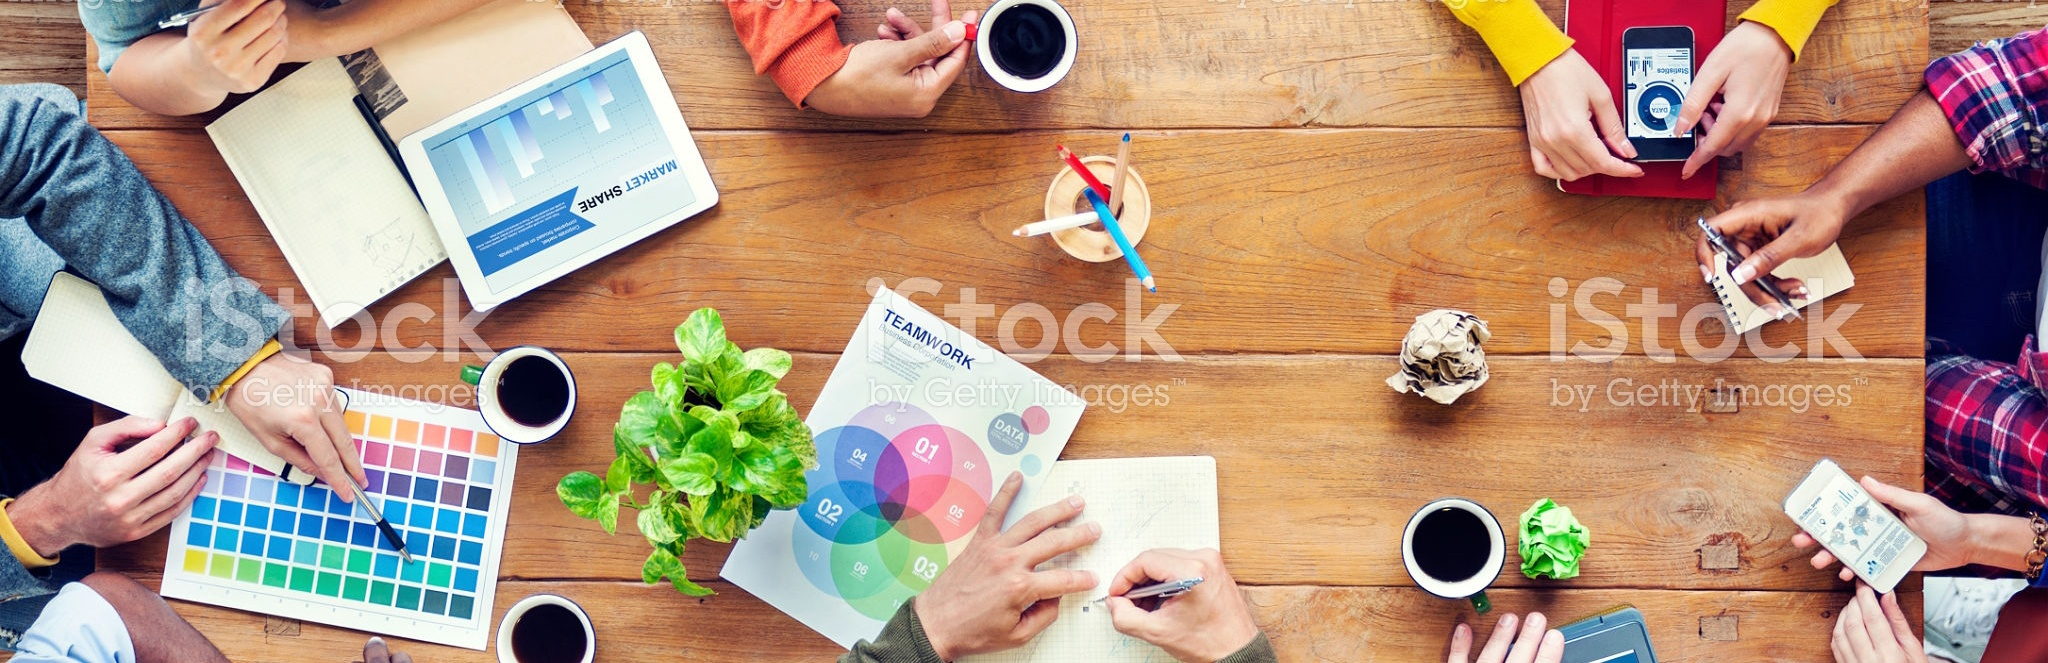 imagen-corporativa-grupo